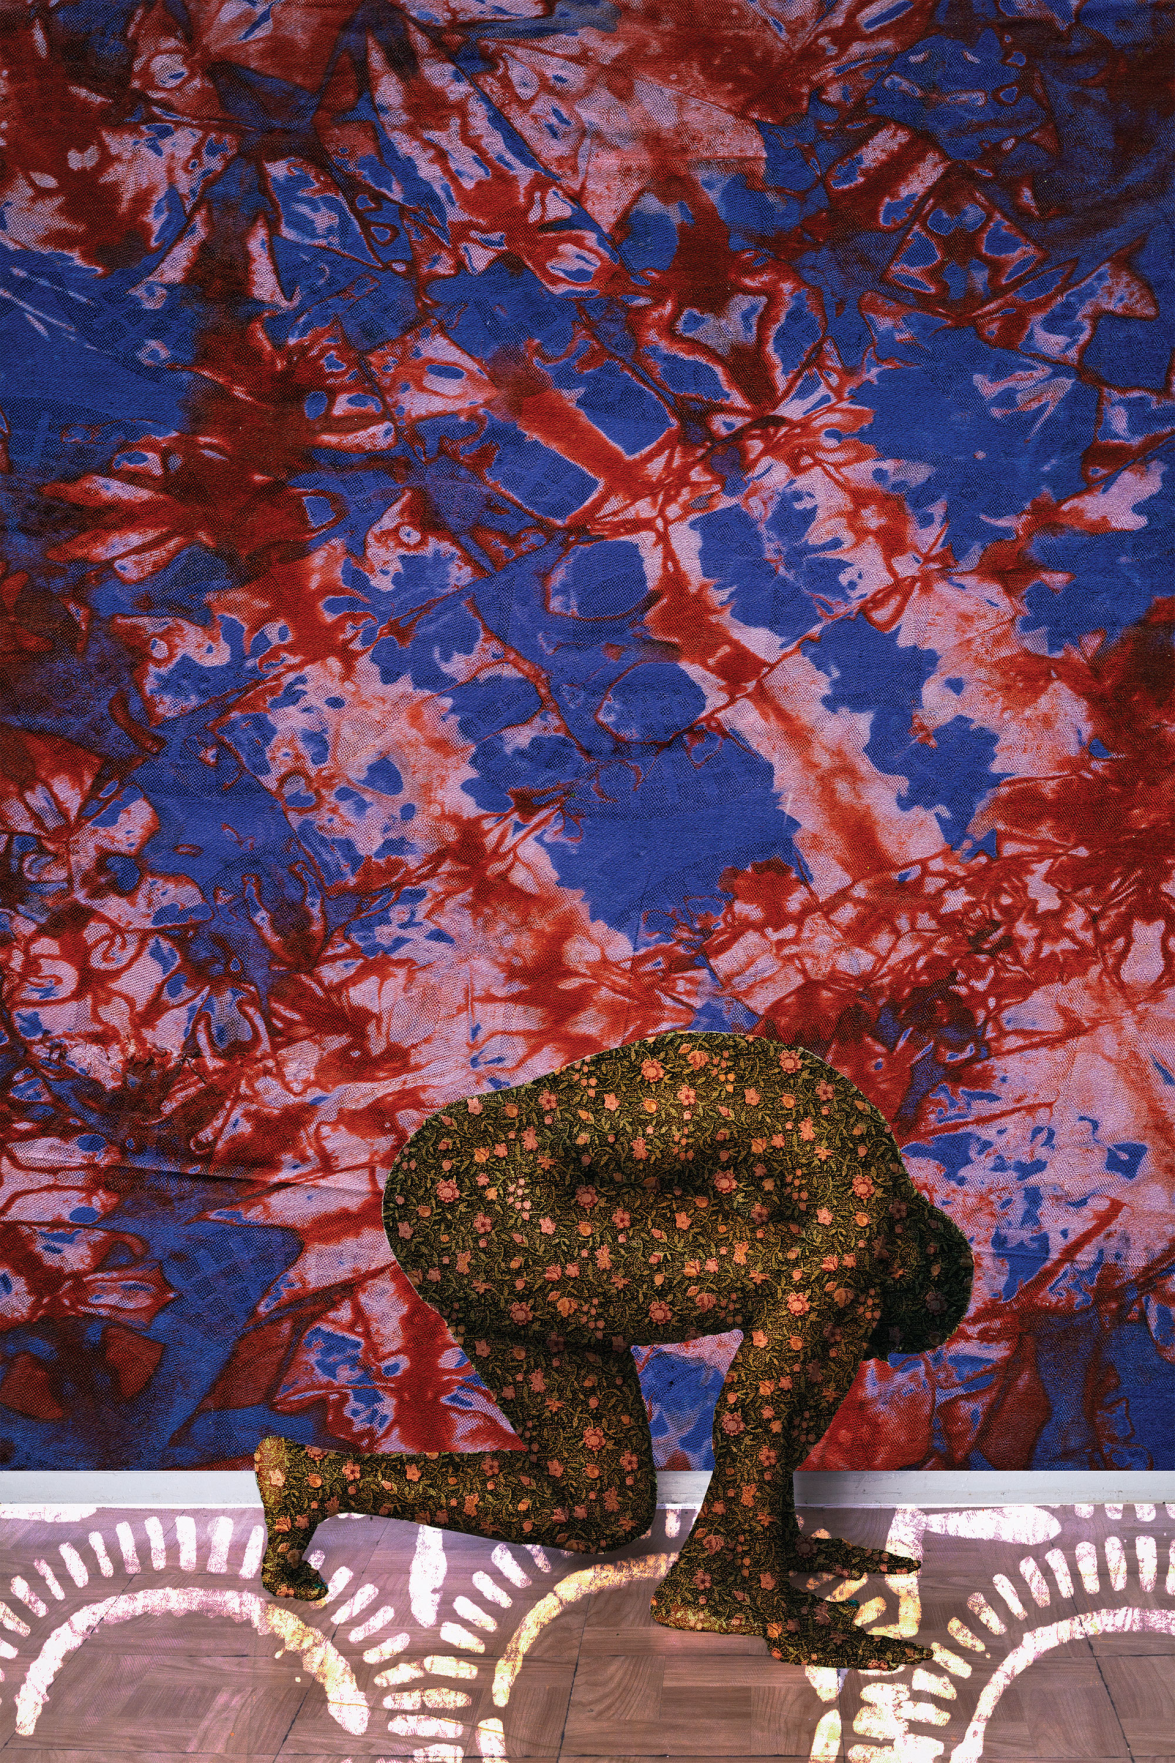 Three <i>Shag</i> Artists on Eroticism, Textiles and Contemporary Art